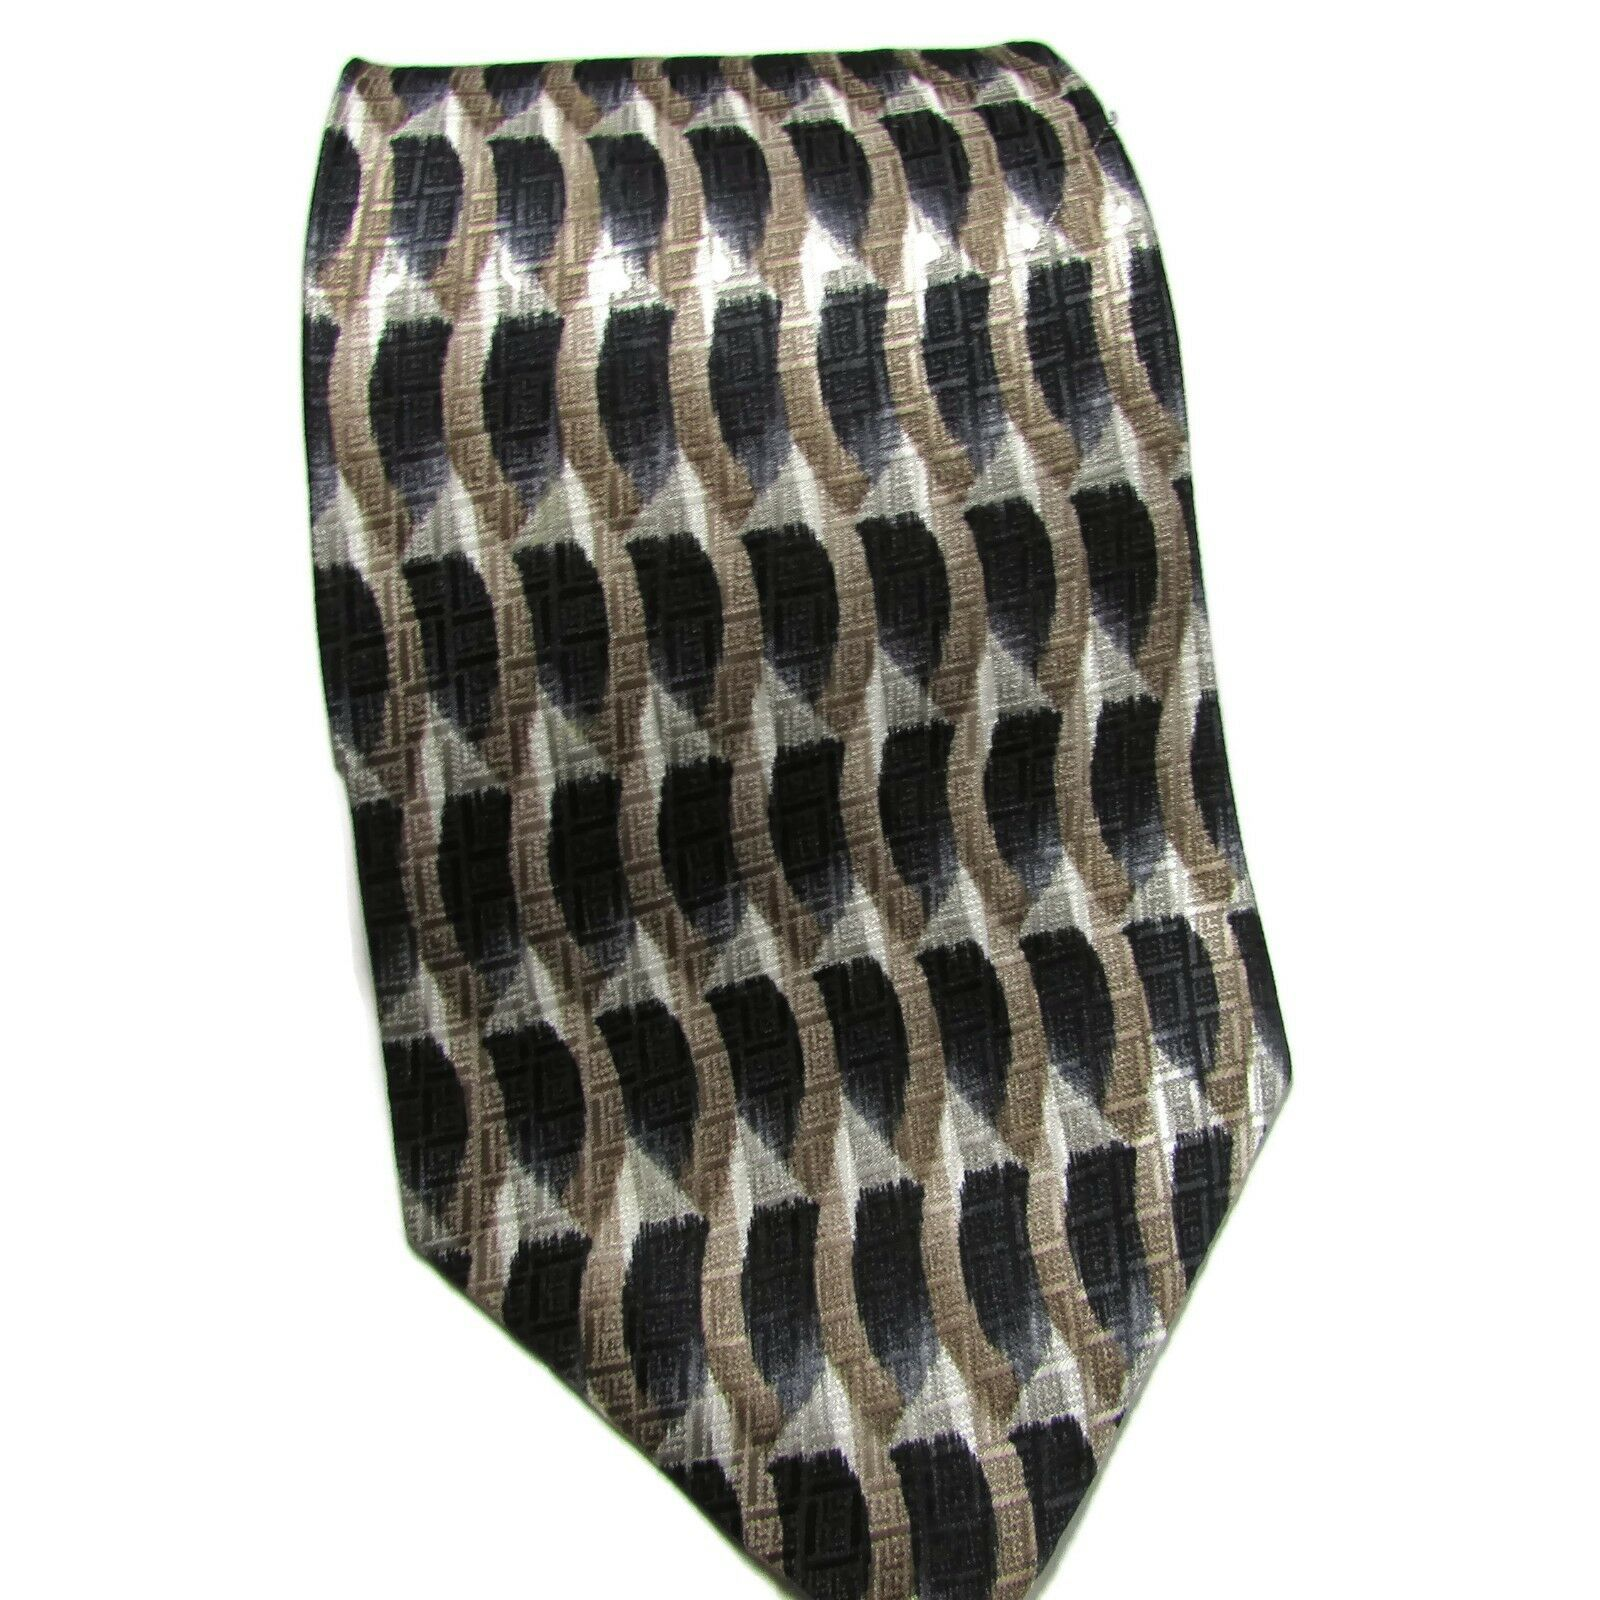 Pierre Cardin Men's Neck Tie Made In The USA Silk59L 4W BOGO 50% off - $11.69